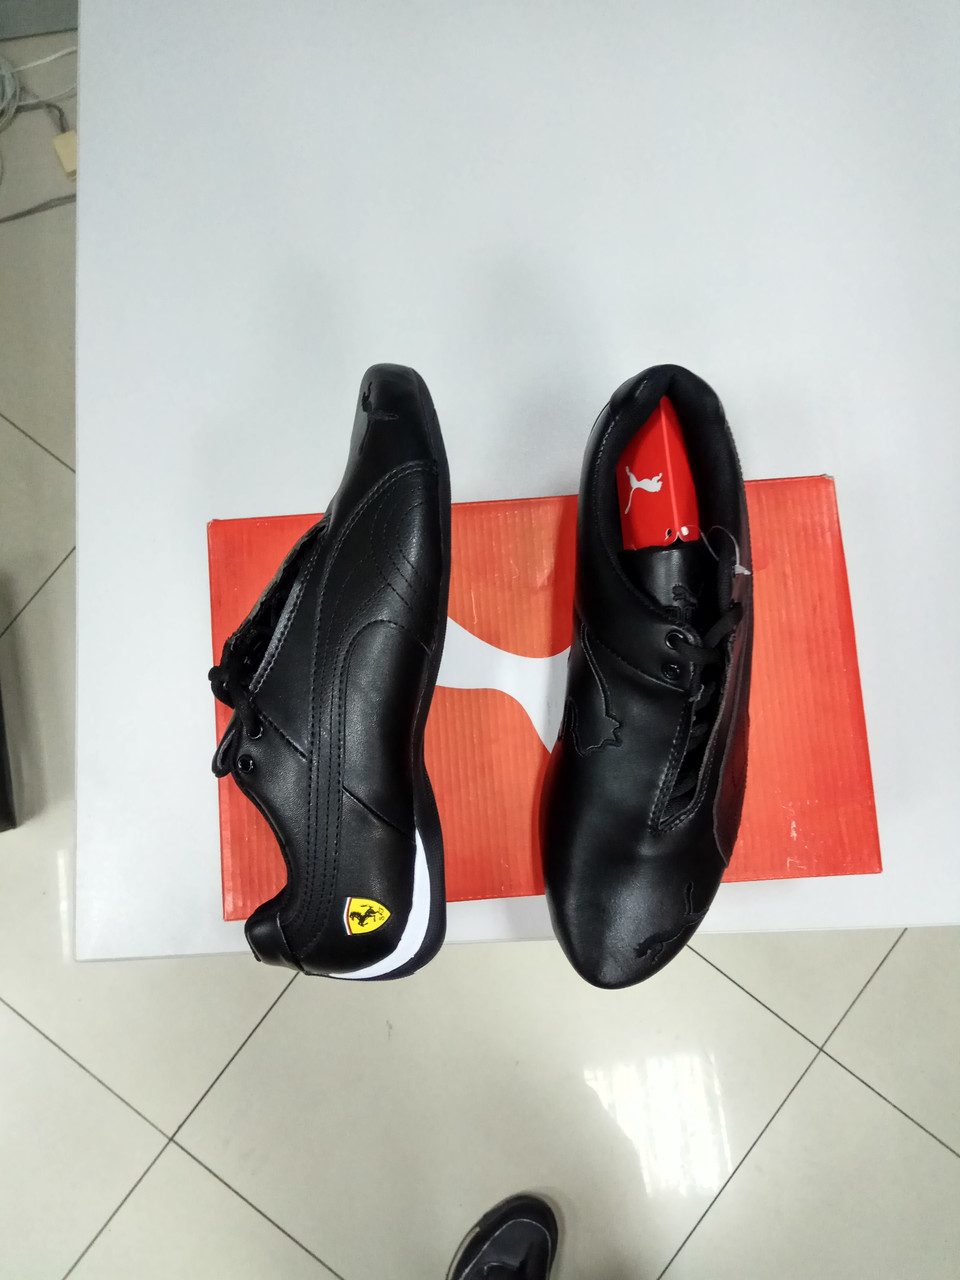 Кроссовки Puma Ferrari Design Black - фото 3